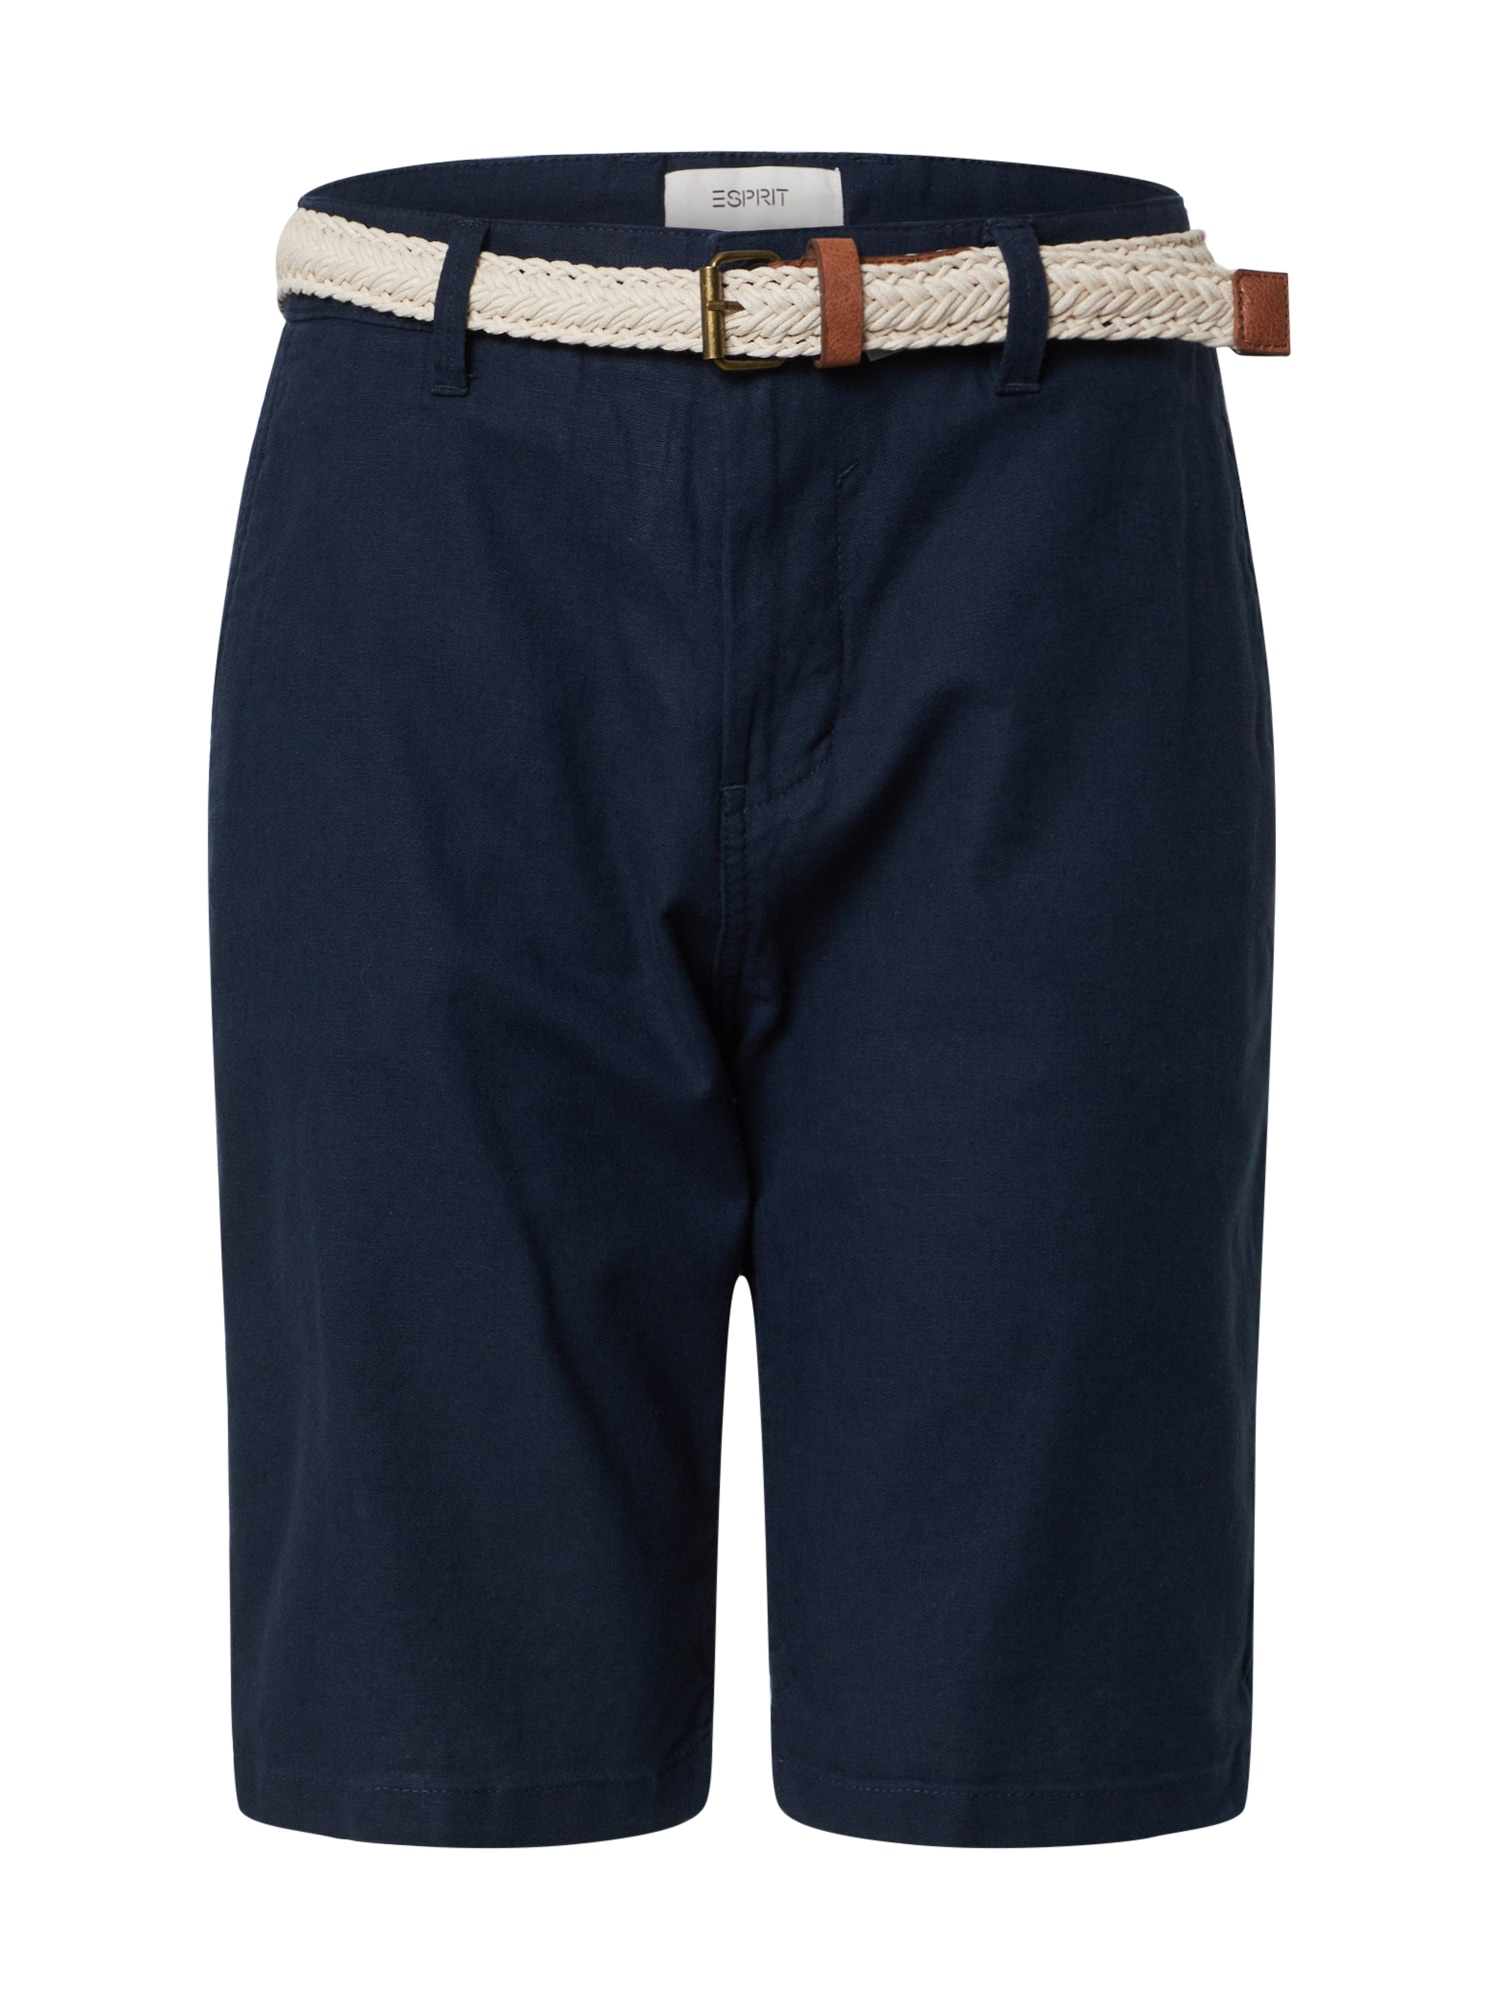 "ESPRIT ""Chino"" stiliaus kelnės 'F BASIC CO/LI' tamsiai mėlyna"